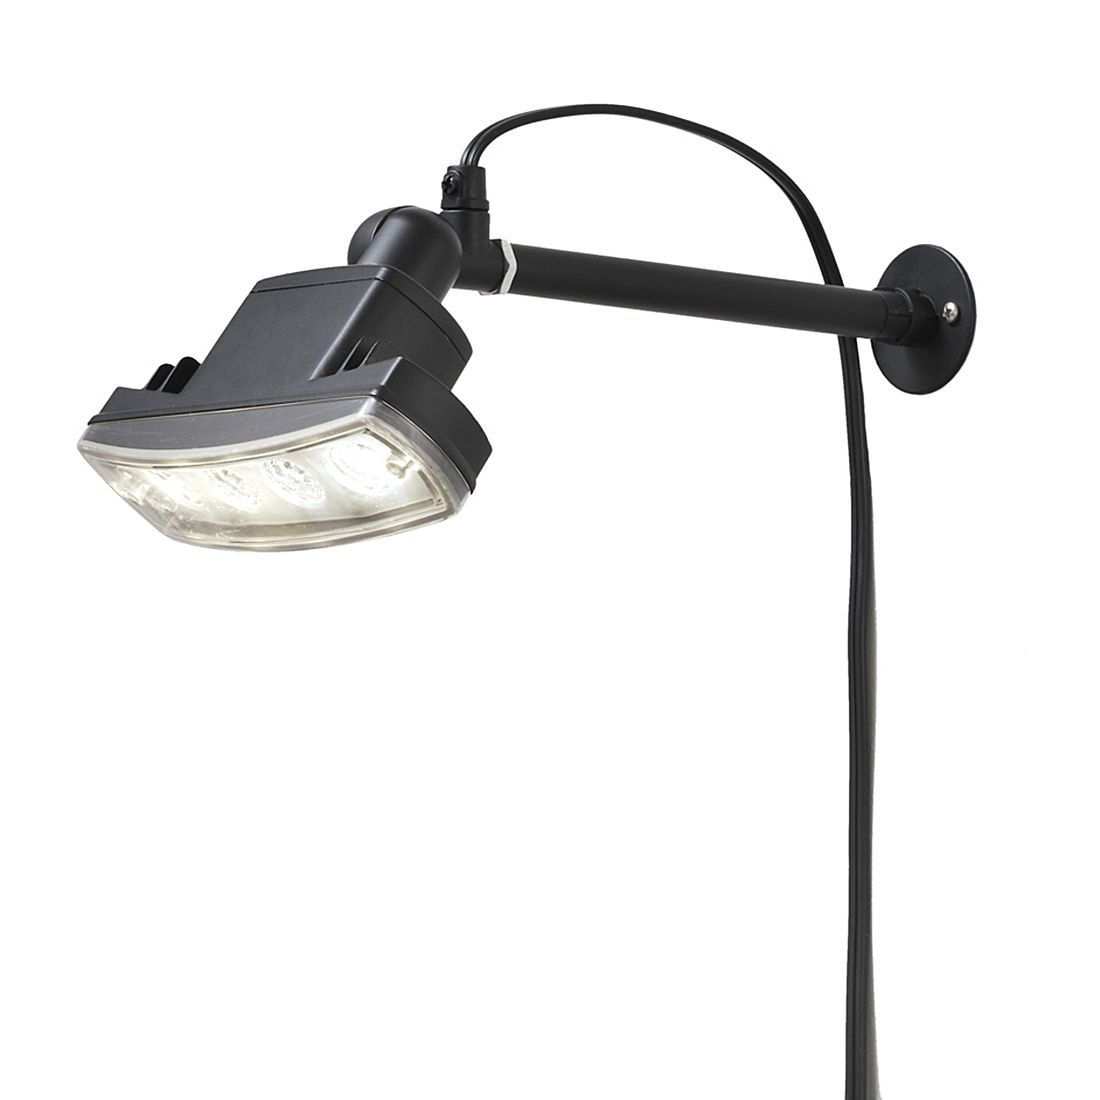 EEK A+, Außenleuchte Amalfi GK – Aluminium/Kunststoff – Schwarz – 4-flammig, Konstsmide jetzt bestellen